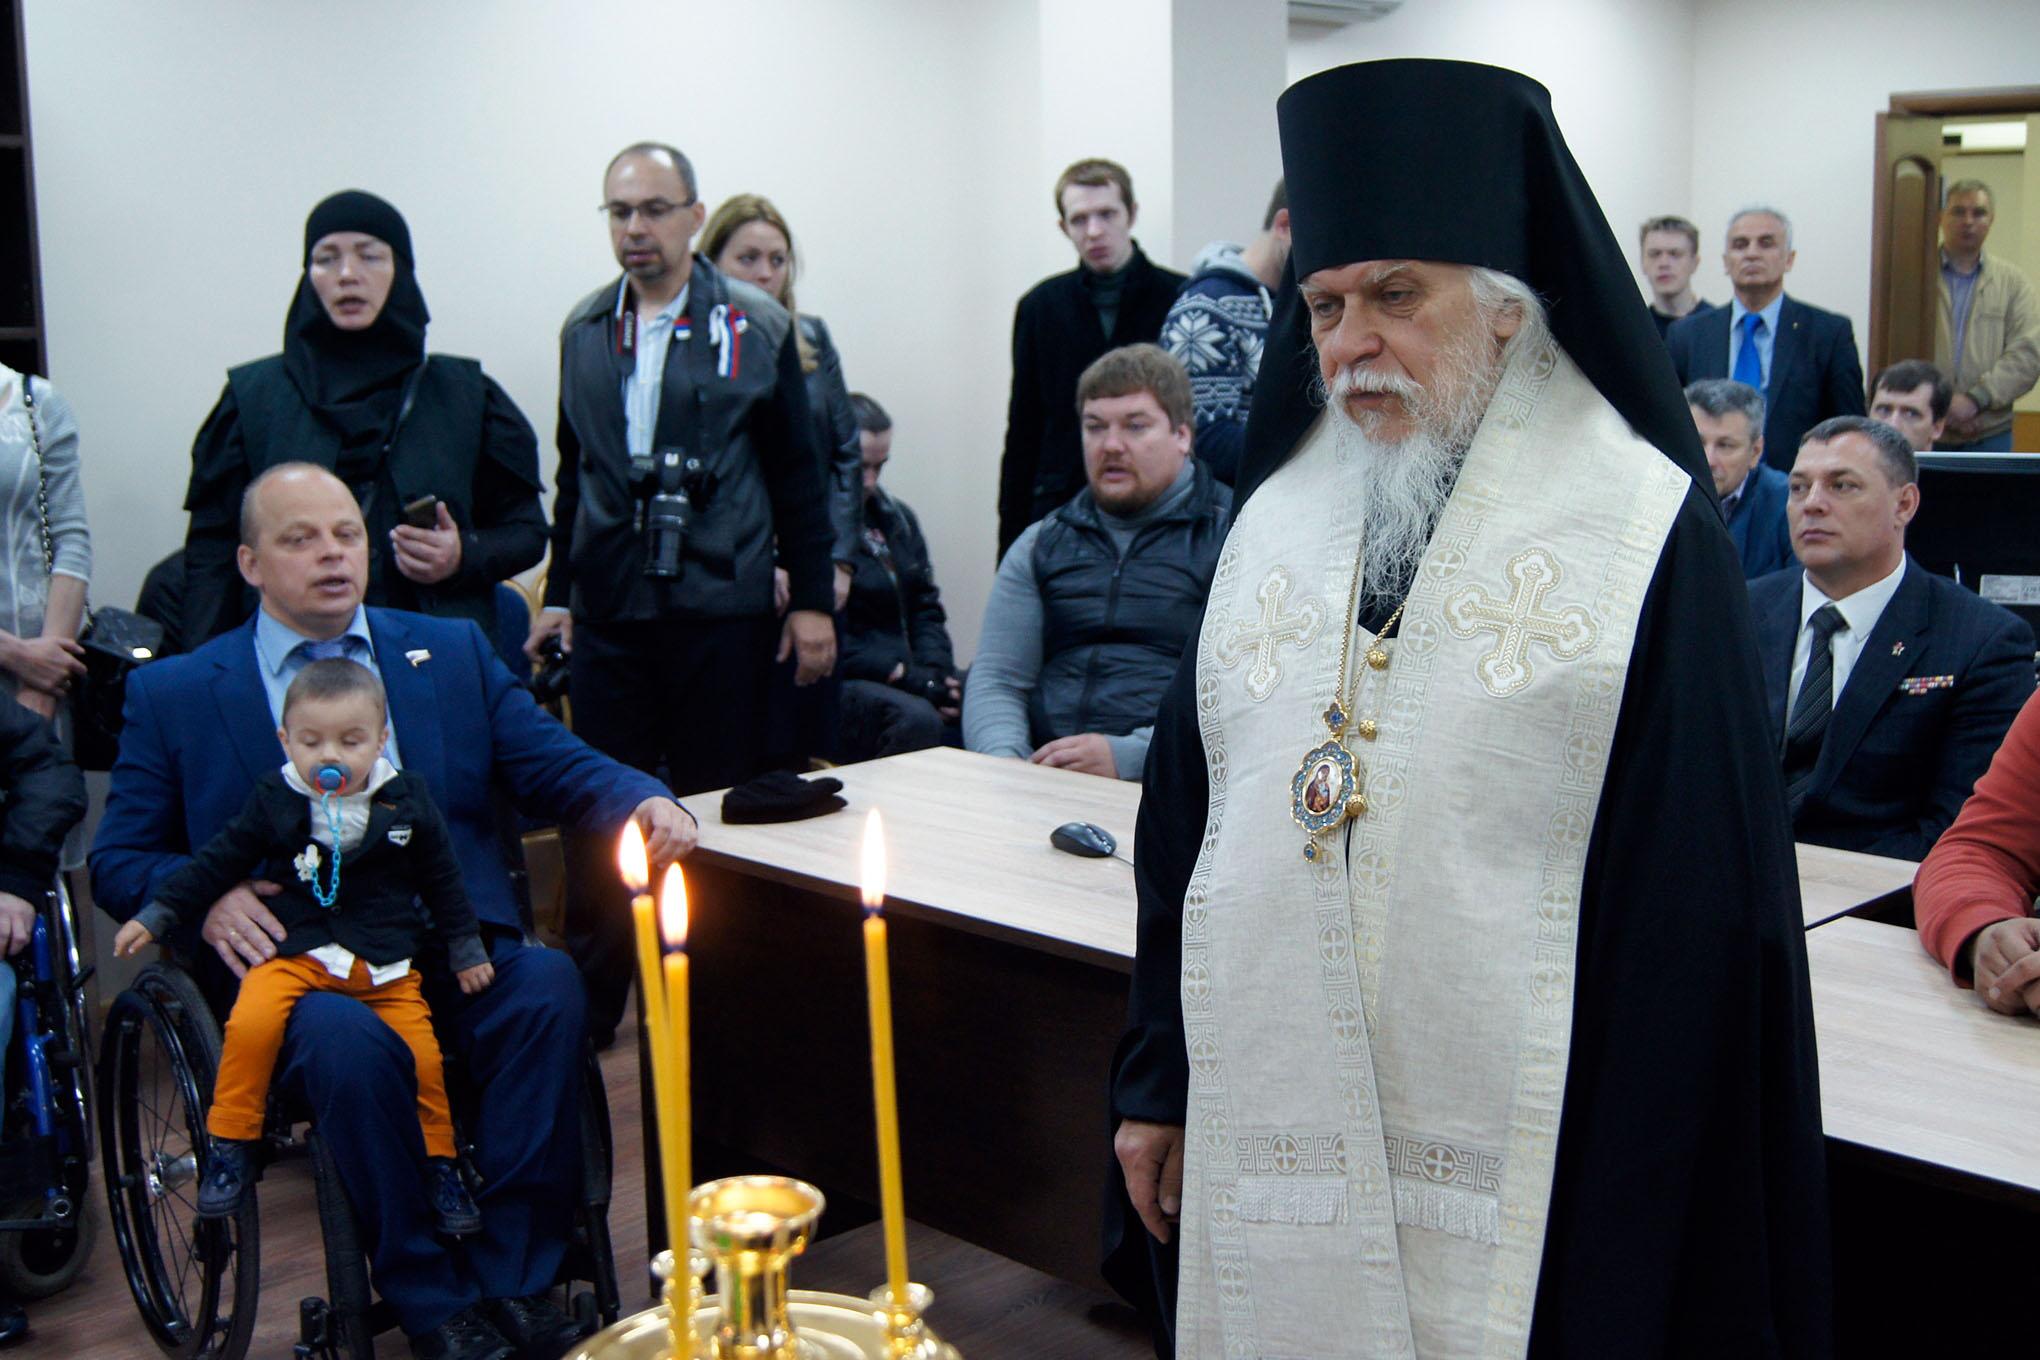 Епископ Пантелеимон совершает молебен.